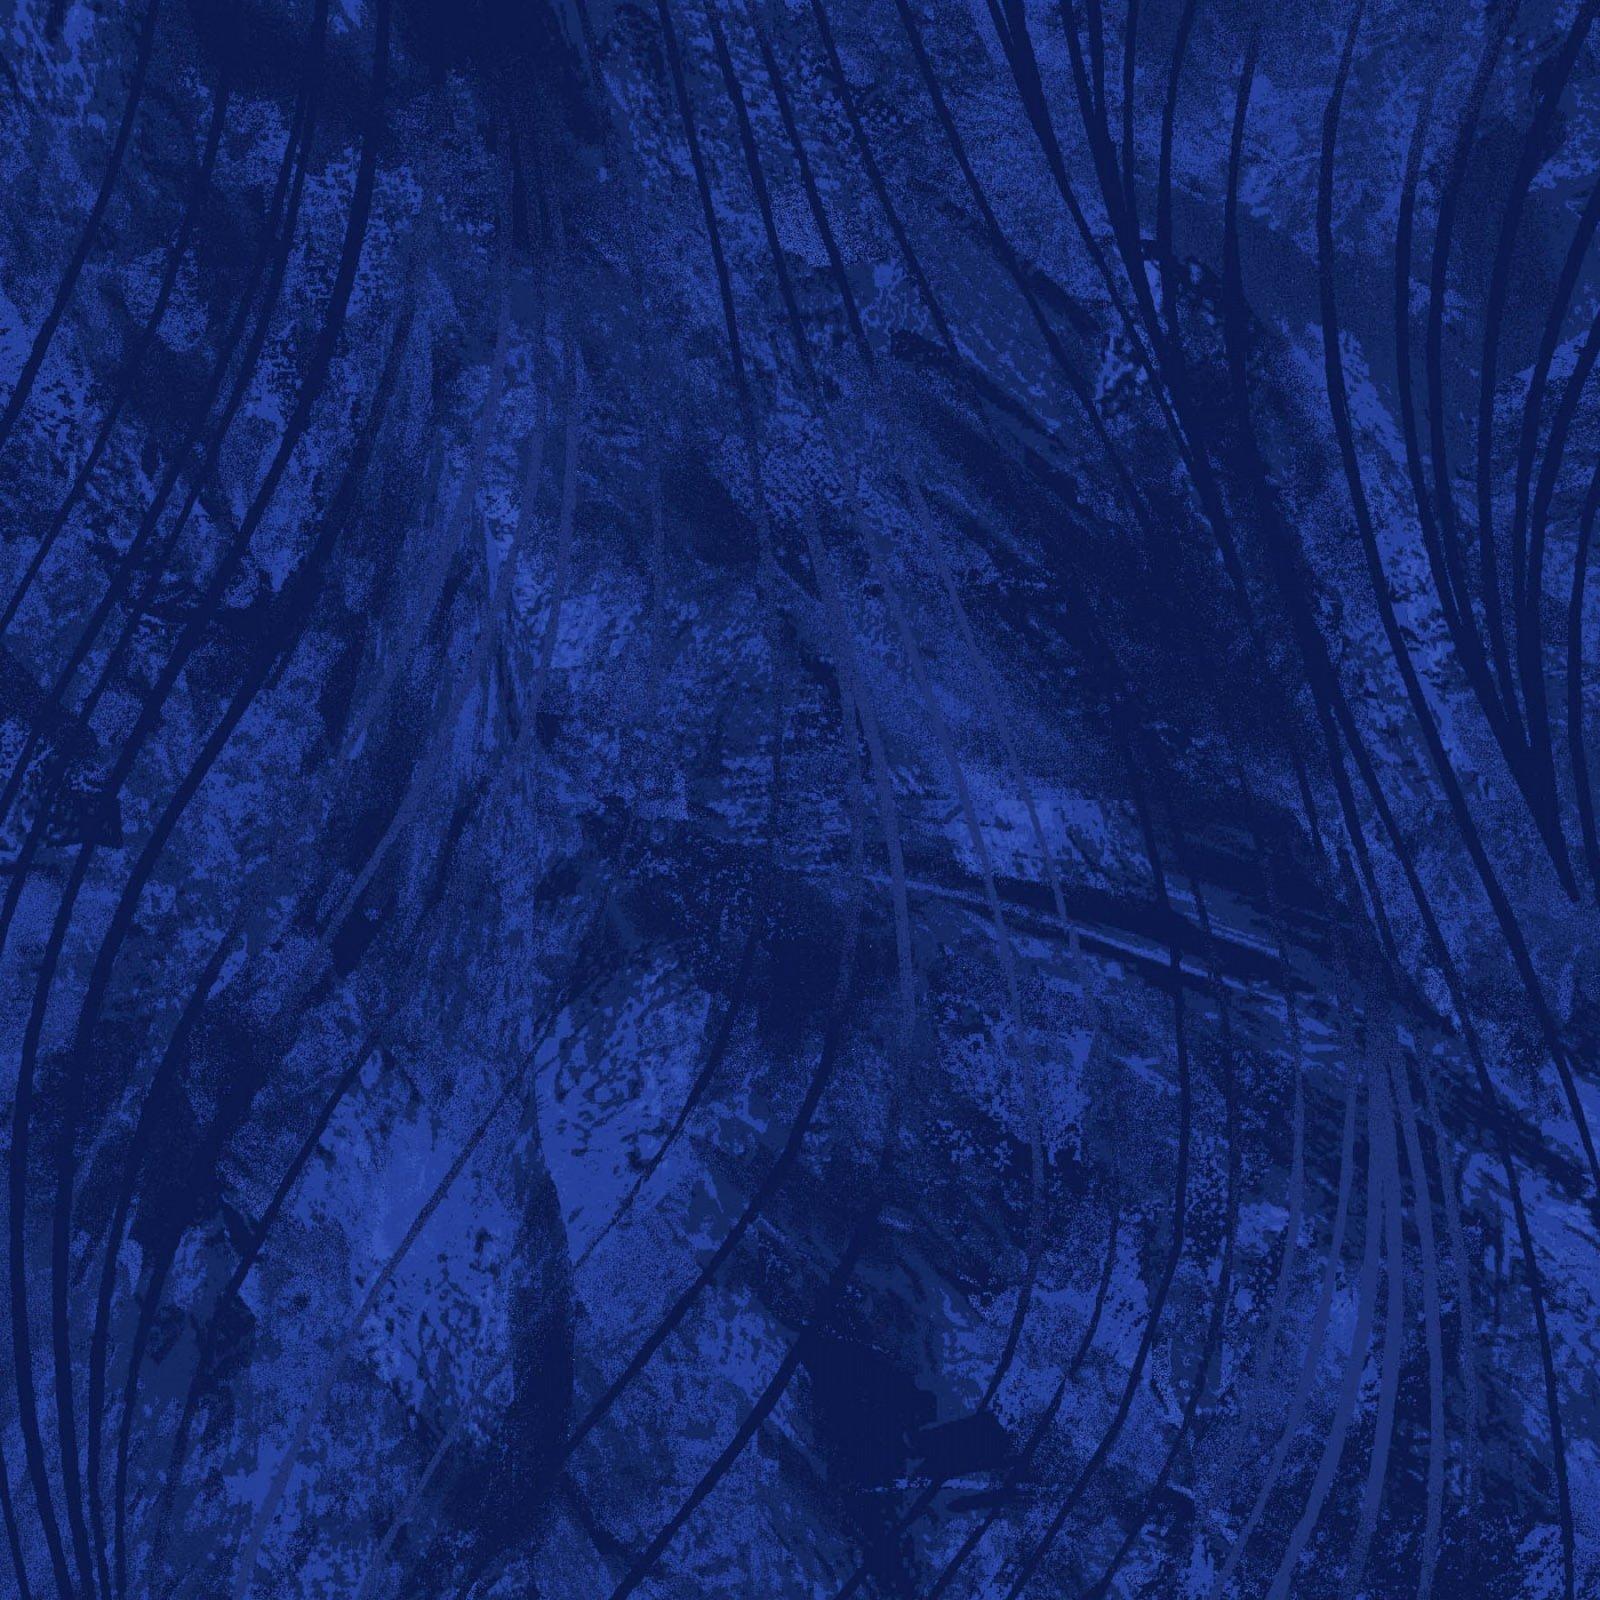 BEAUTIFUL BACKING 108 WIDE DK BLUE